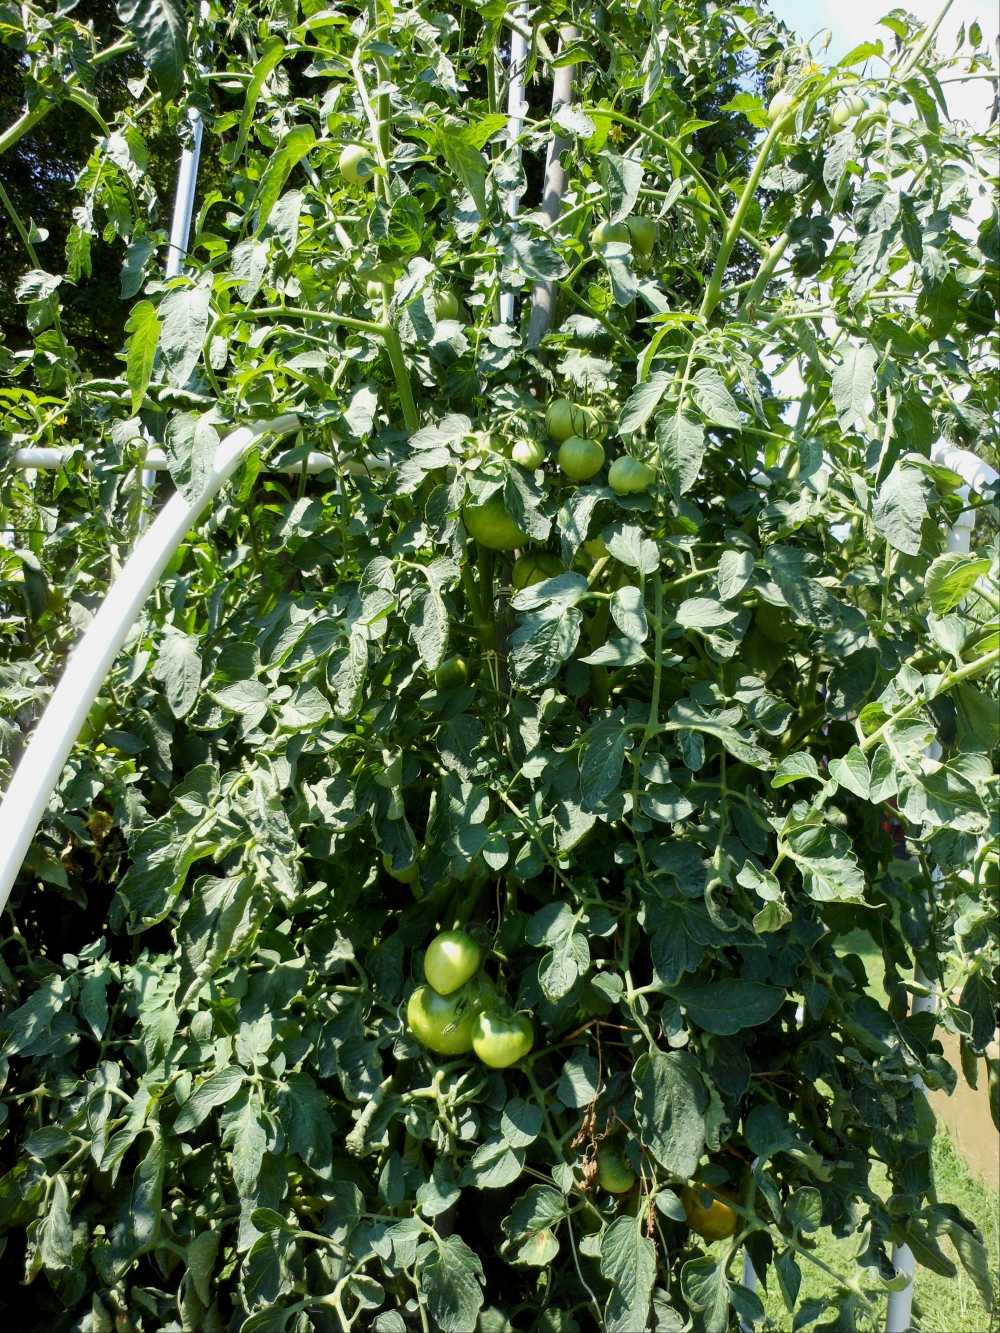 07-11-14_Tomatoes_New_Garden_03